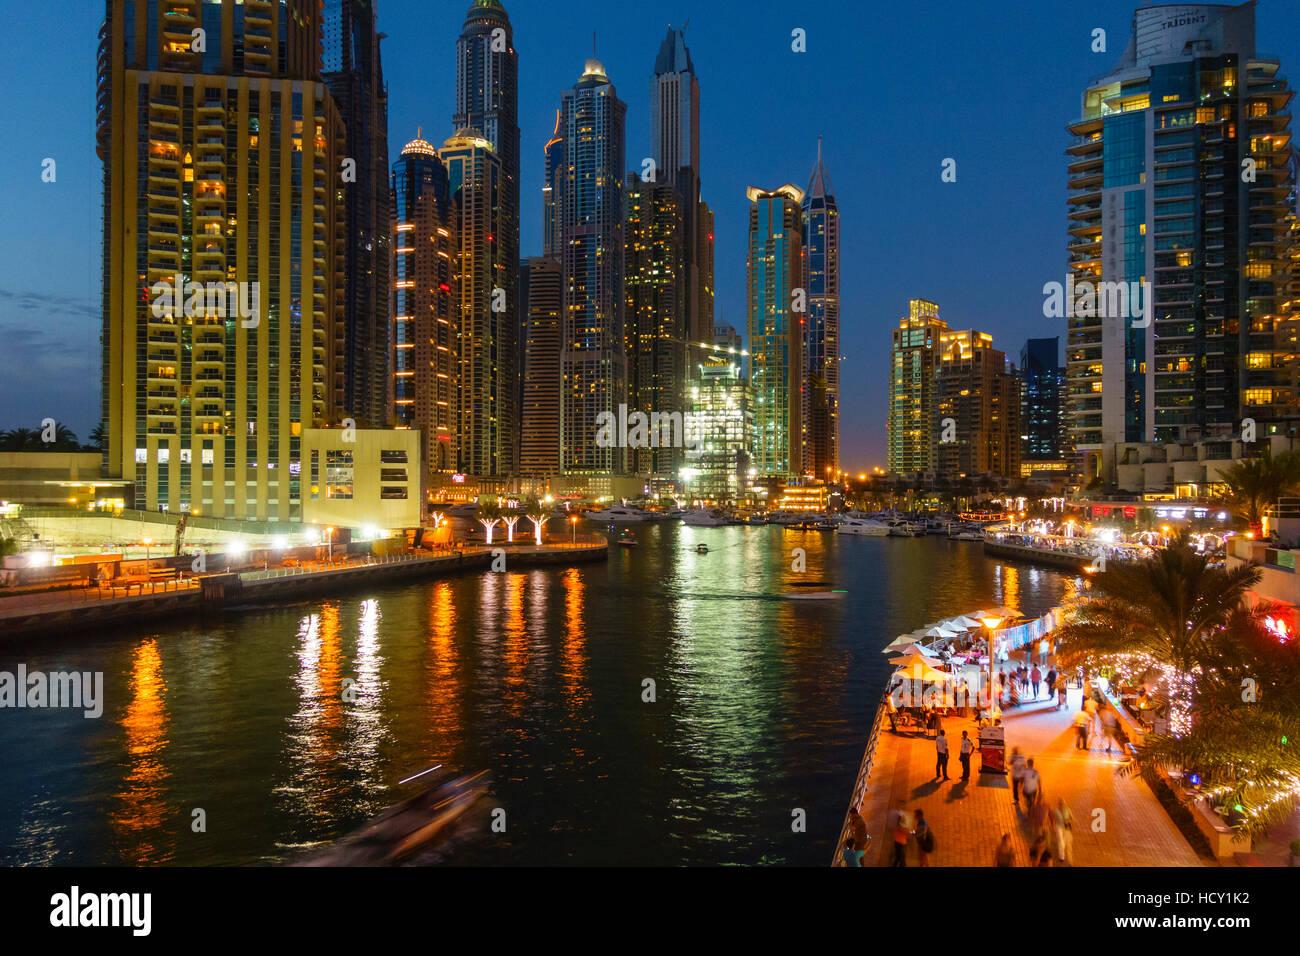 Dubai Marina by night, Dubai, United Arab Emirates, Middle East - Stock Image